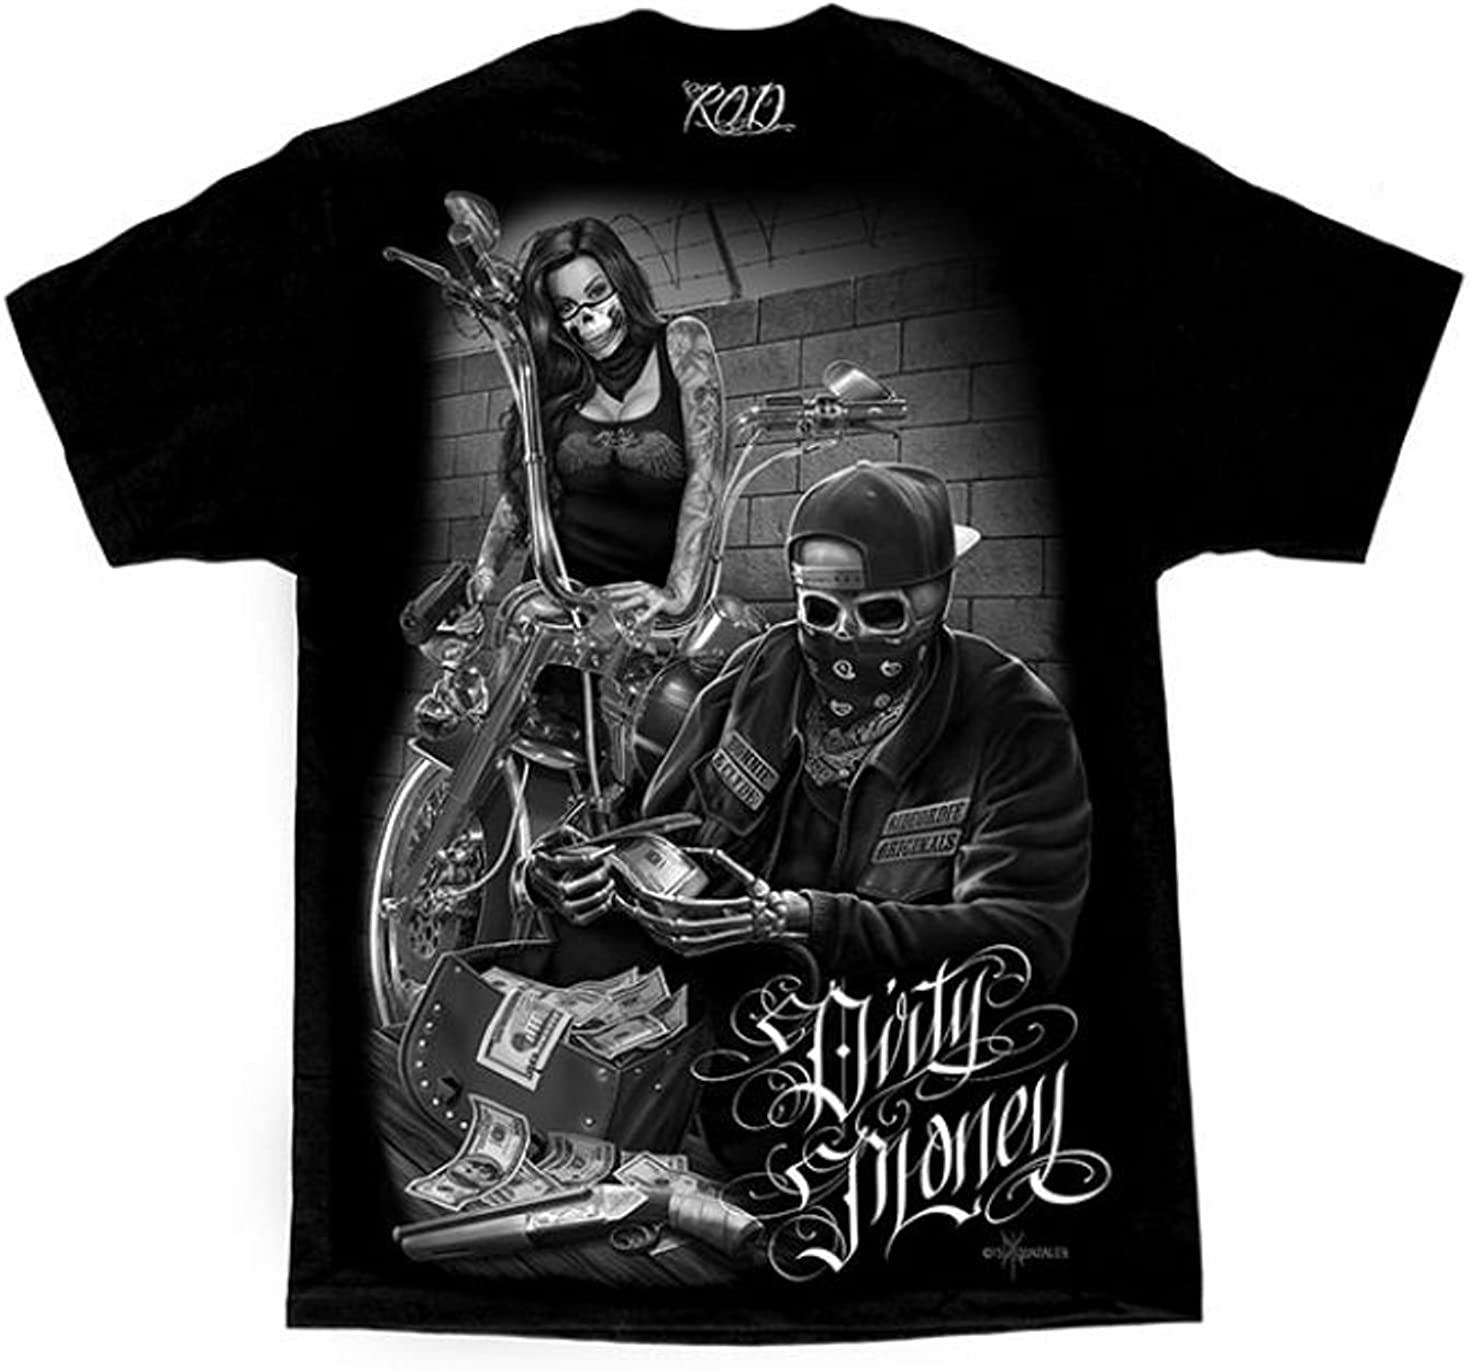 Bonnie & Clyde Dirty Money David Gonzales Art DGA Ride Or Die Men's T Shirt